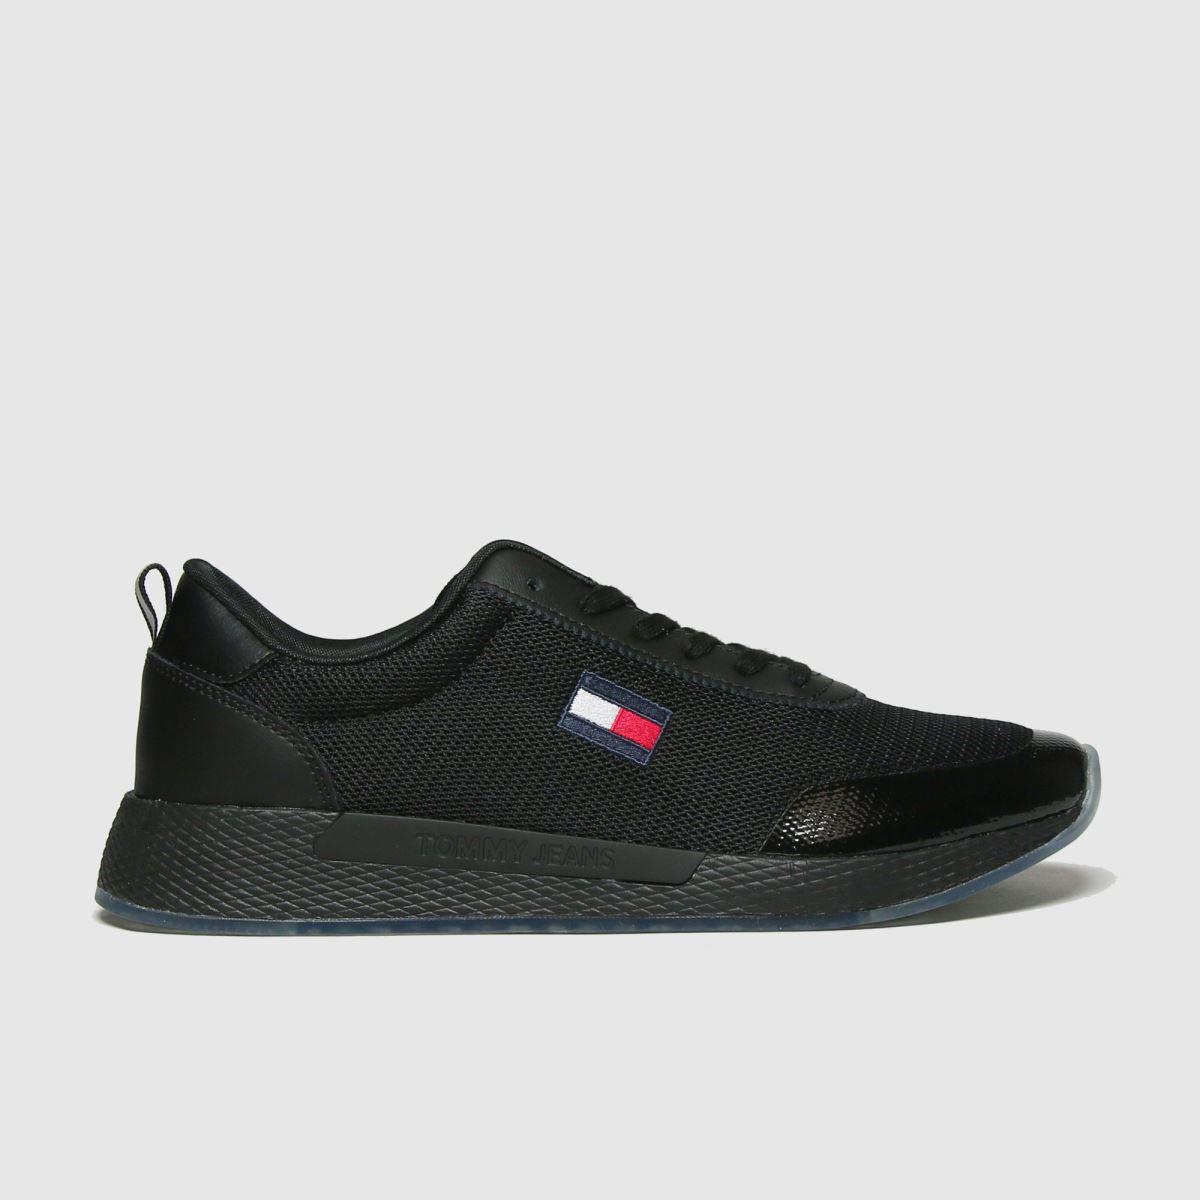 Tommy Hilfiger Black Flexi Runner Sneaker Trainers